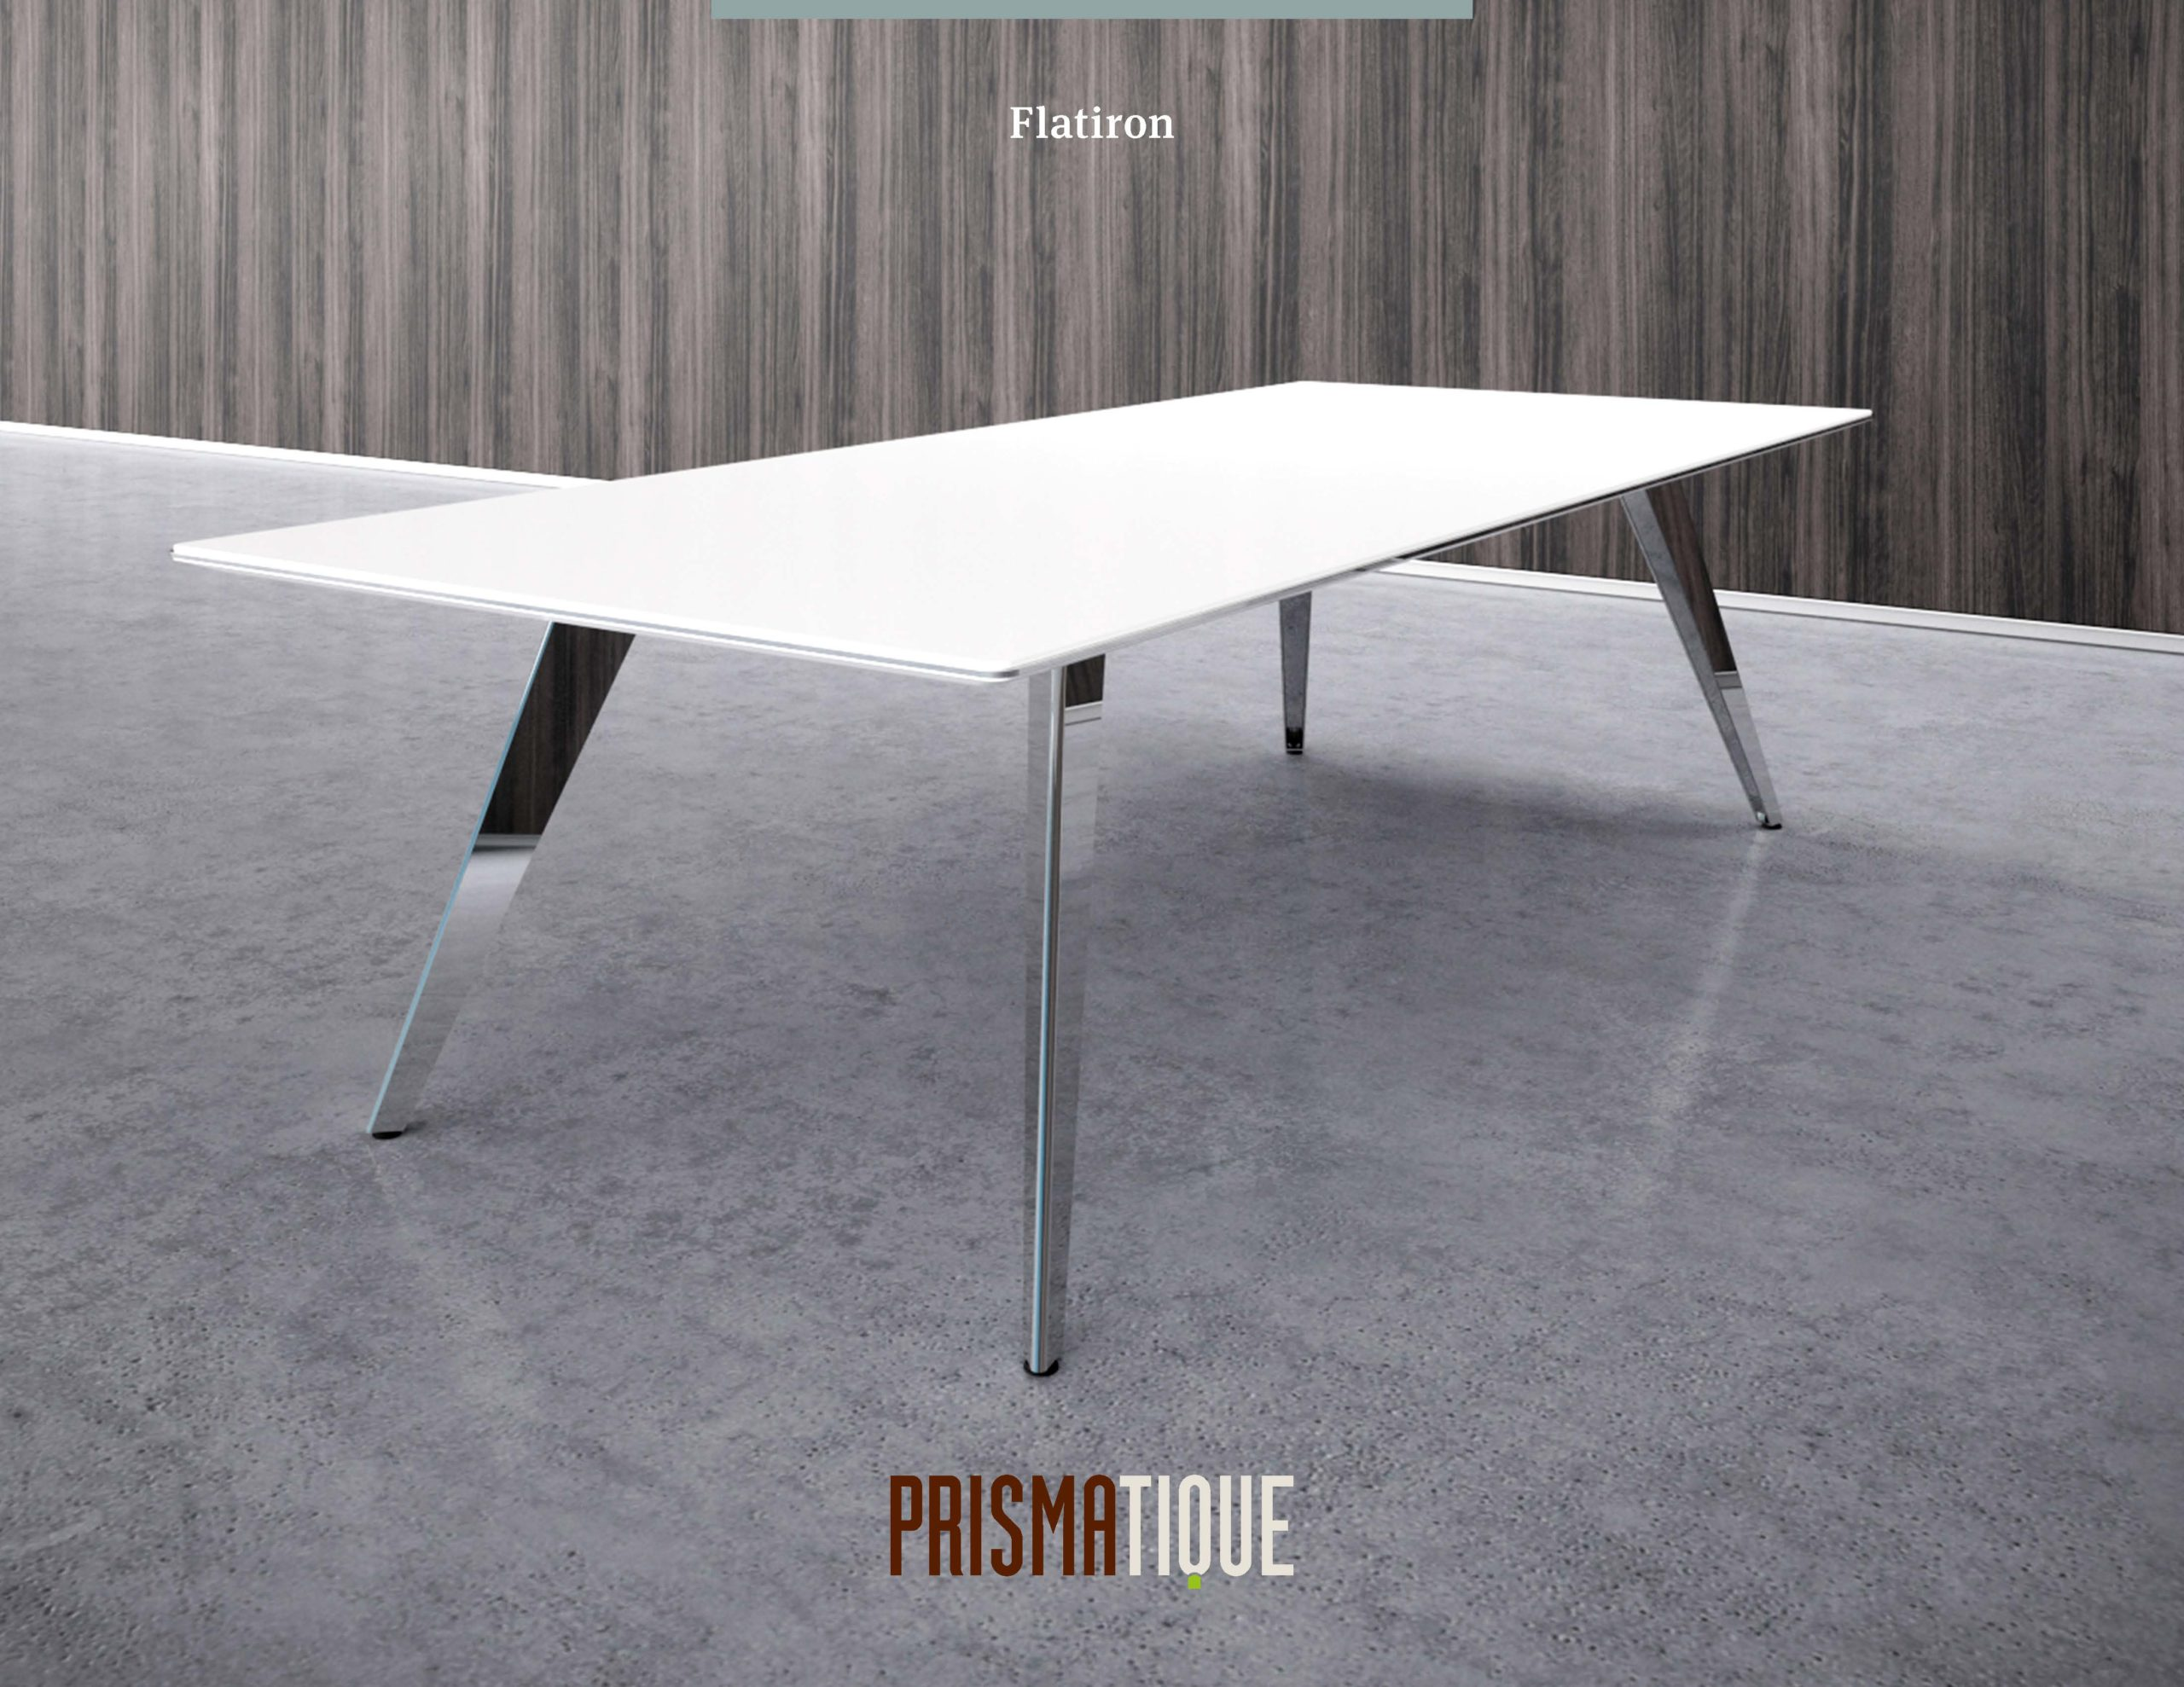 Prismatique Catalog_Flatiron Brochure Cover